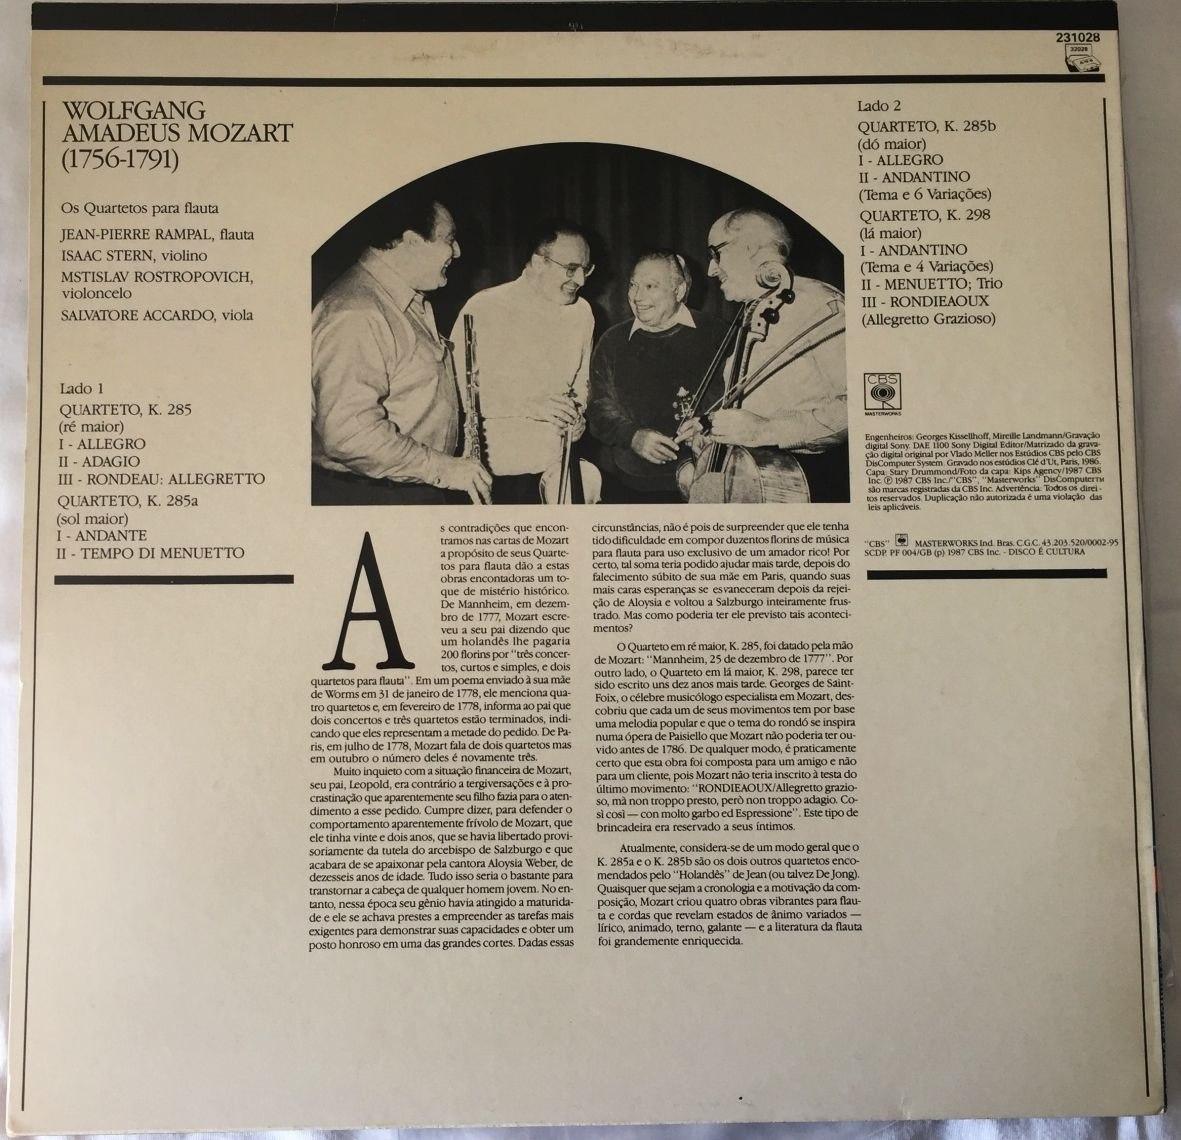 Lp Mozart Rampal The Flute Quartets Rostropovich